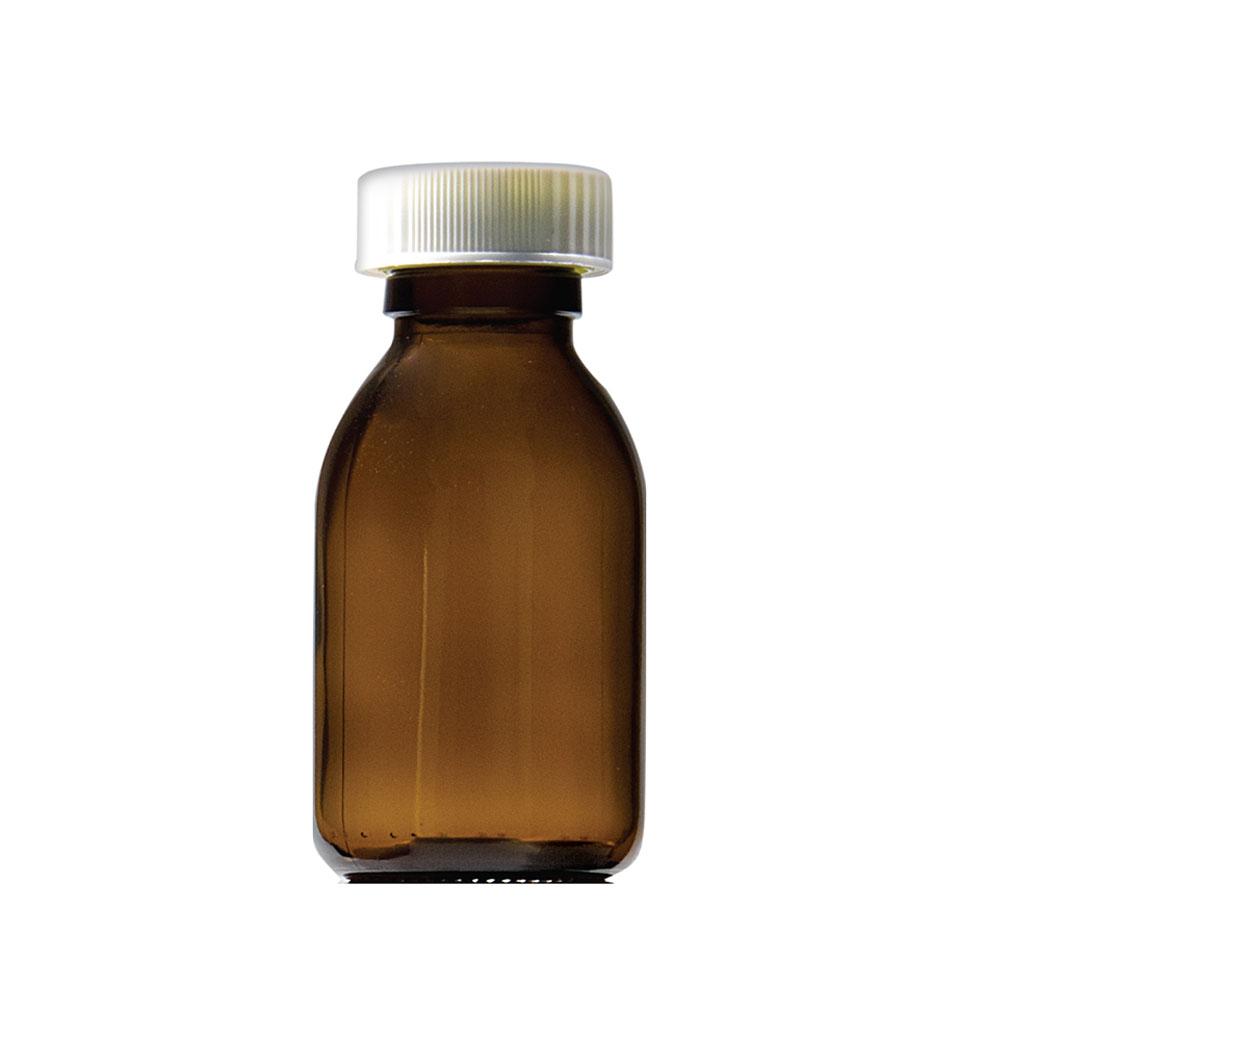 Capped Glass Medicine Bottle - Pack of 36